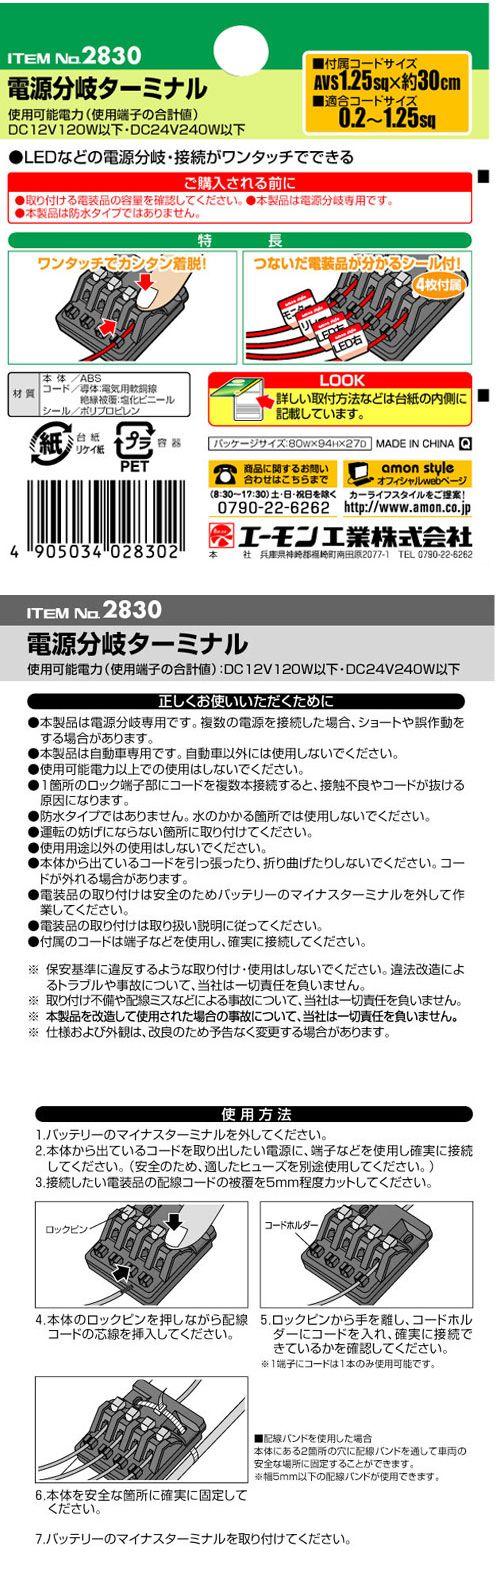 【amon】電源分接端子接頭 - 「Webike-摩托百貨」